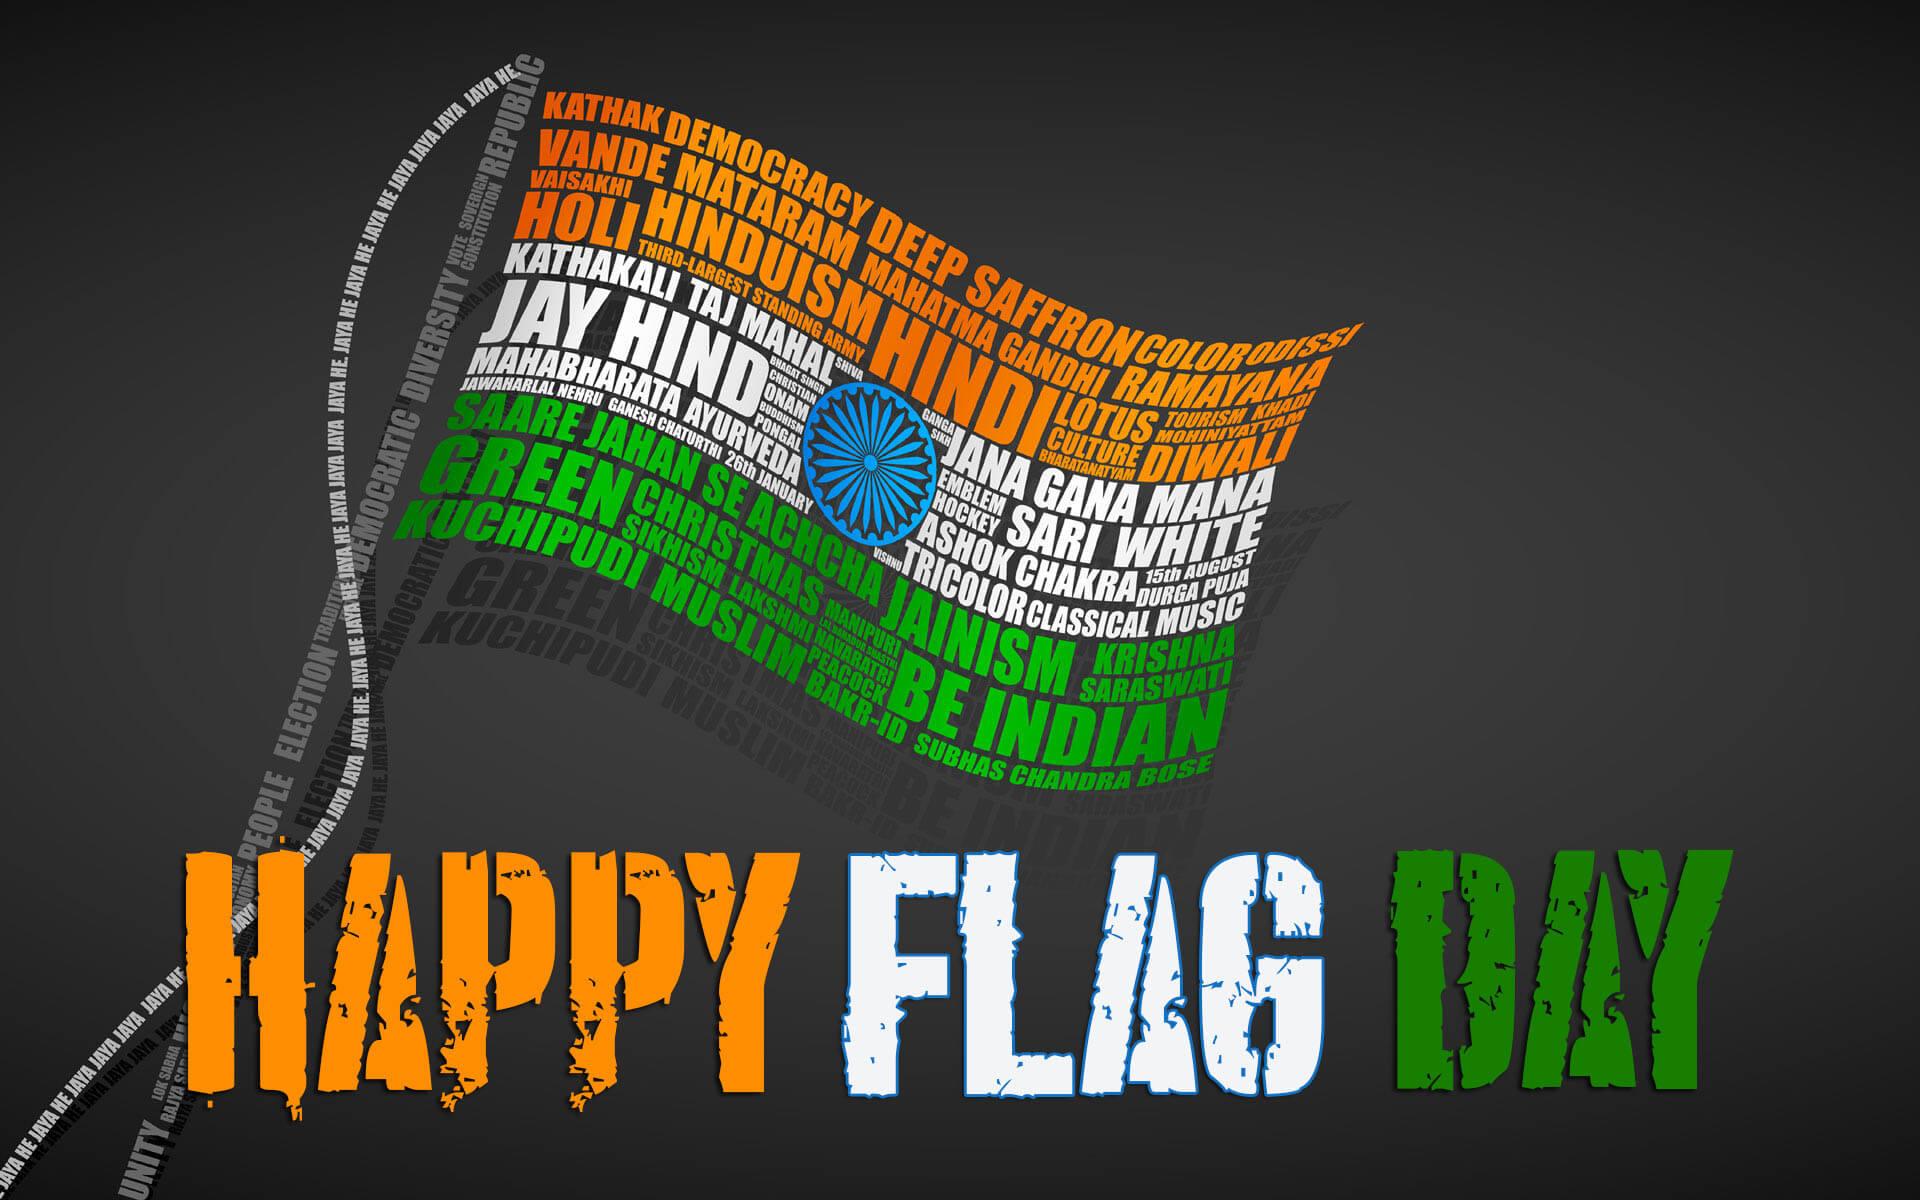 happy flag day india hd desktop wallpaper